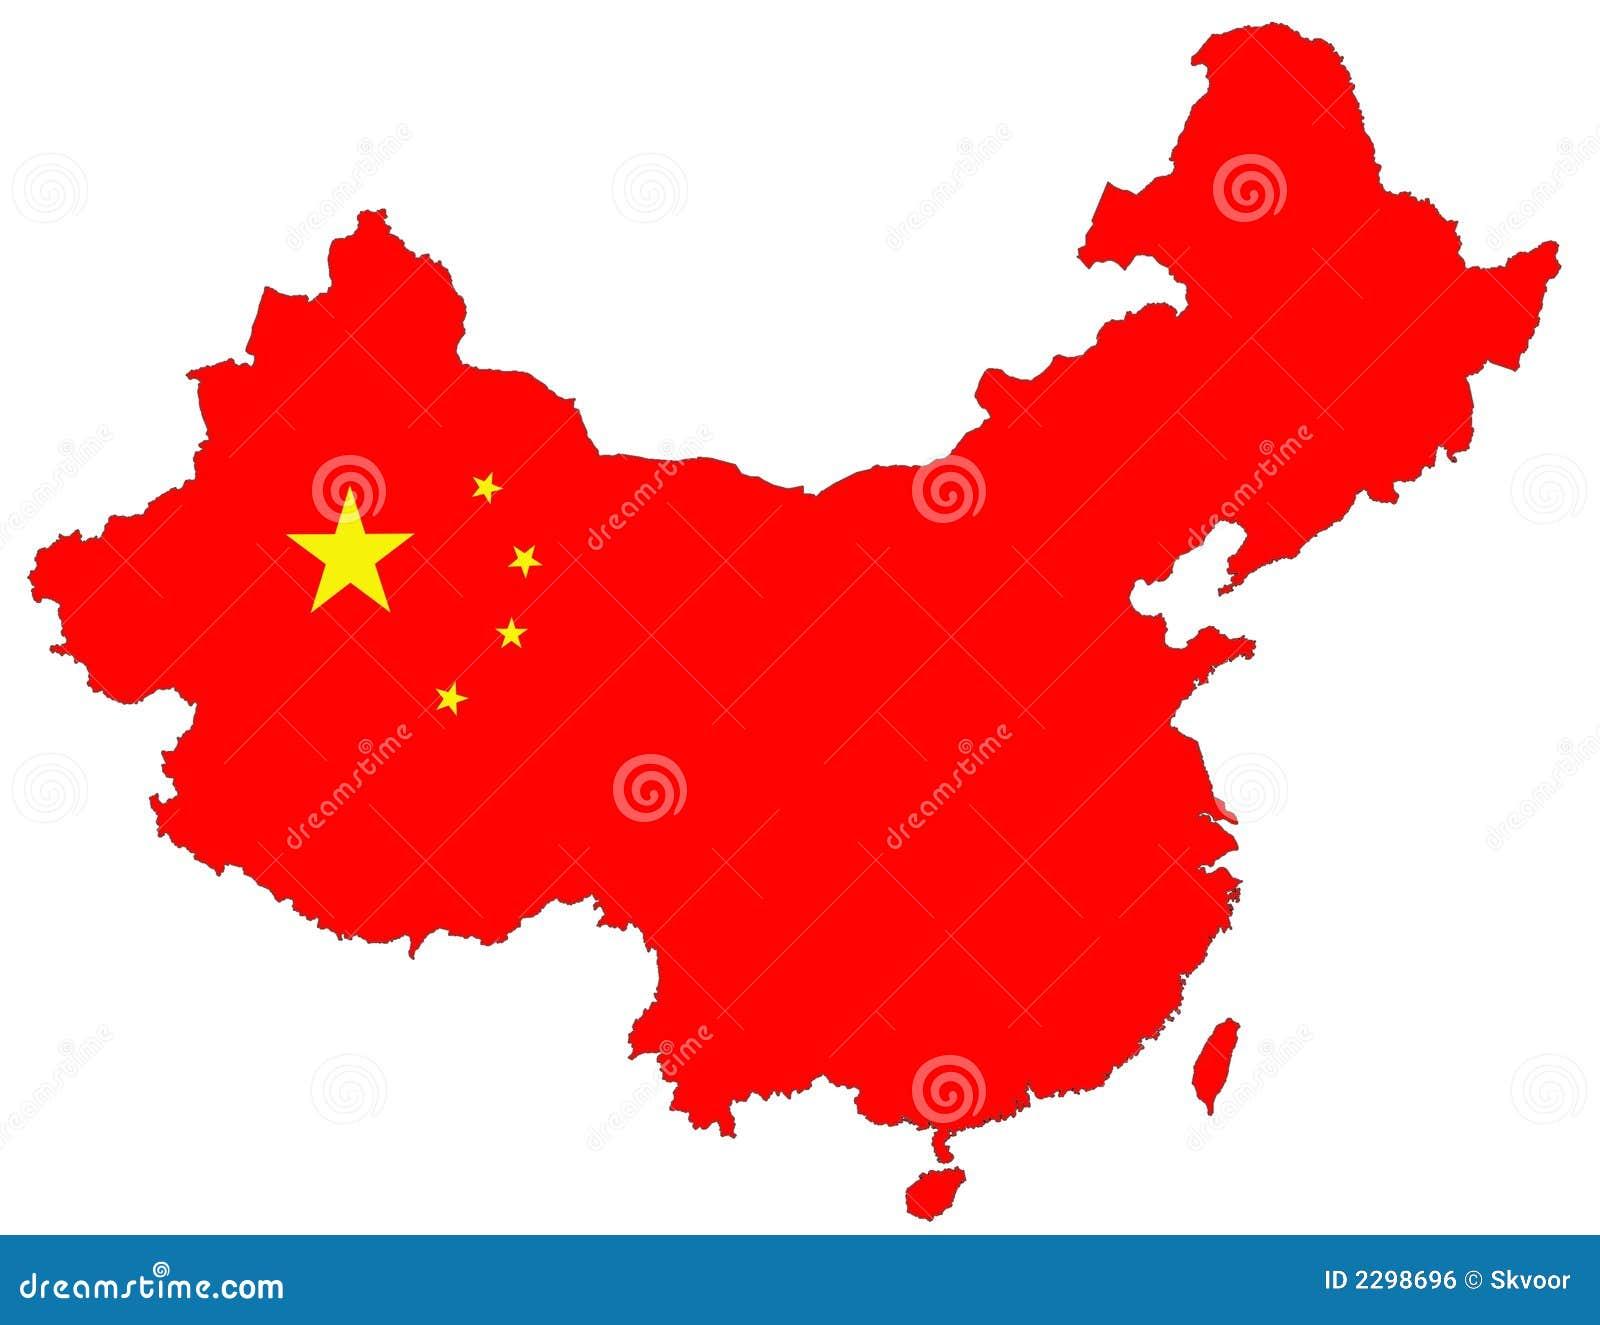 carte rouge d 39 isolement de la chine illustration stock illustration du blanc pays 2298696. Black Bedroom Furniture Sets. Home Design Ideas